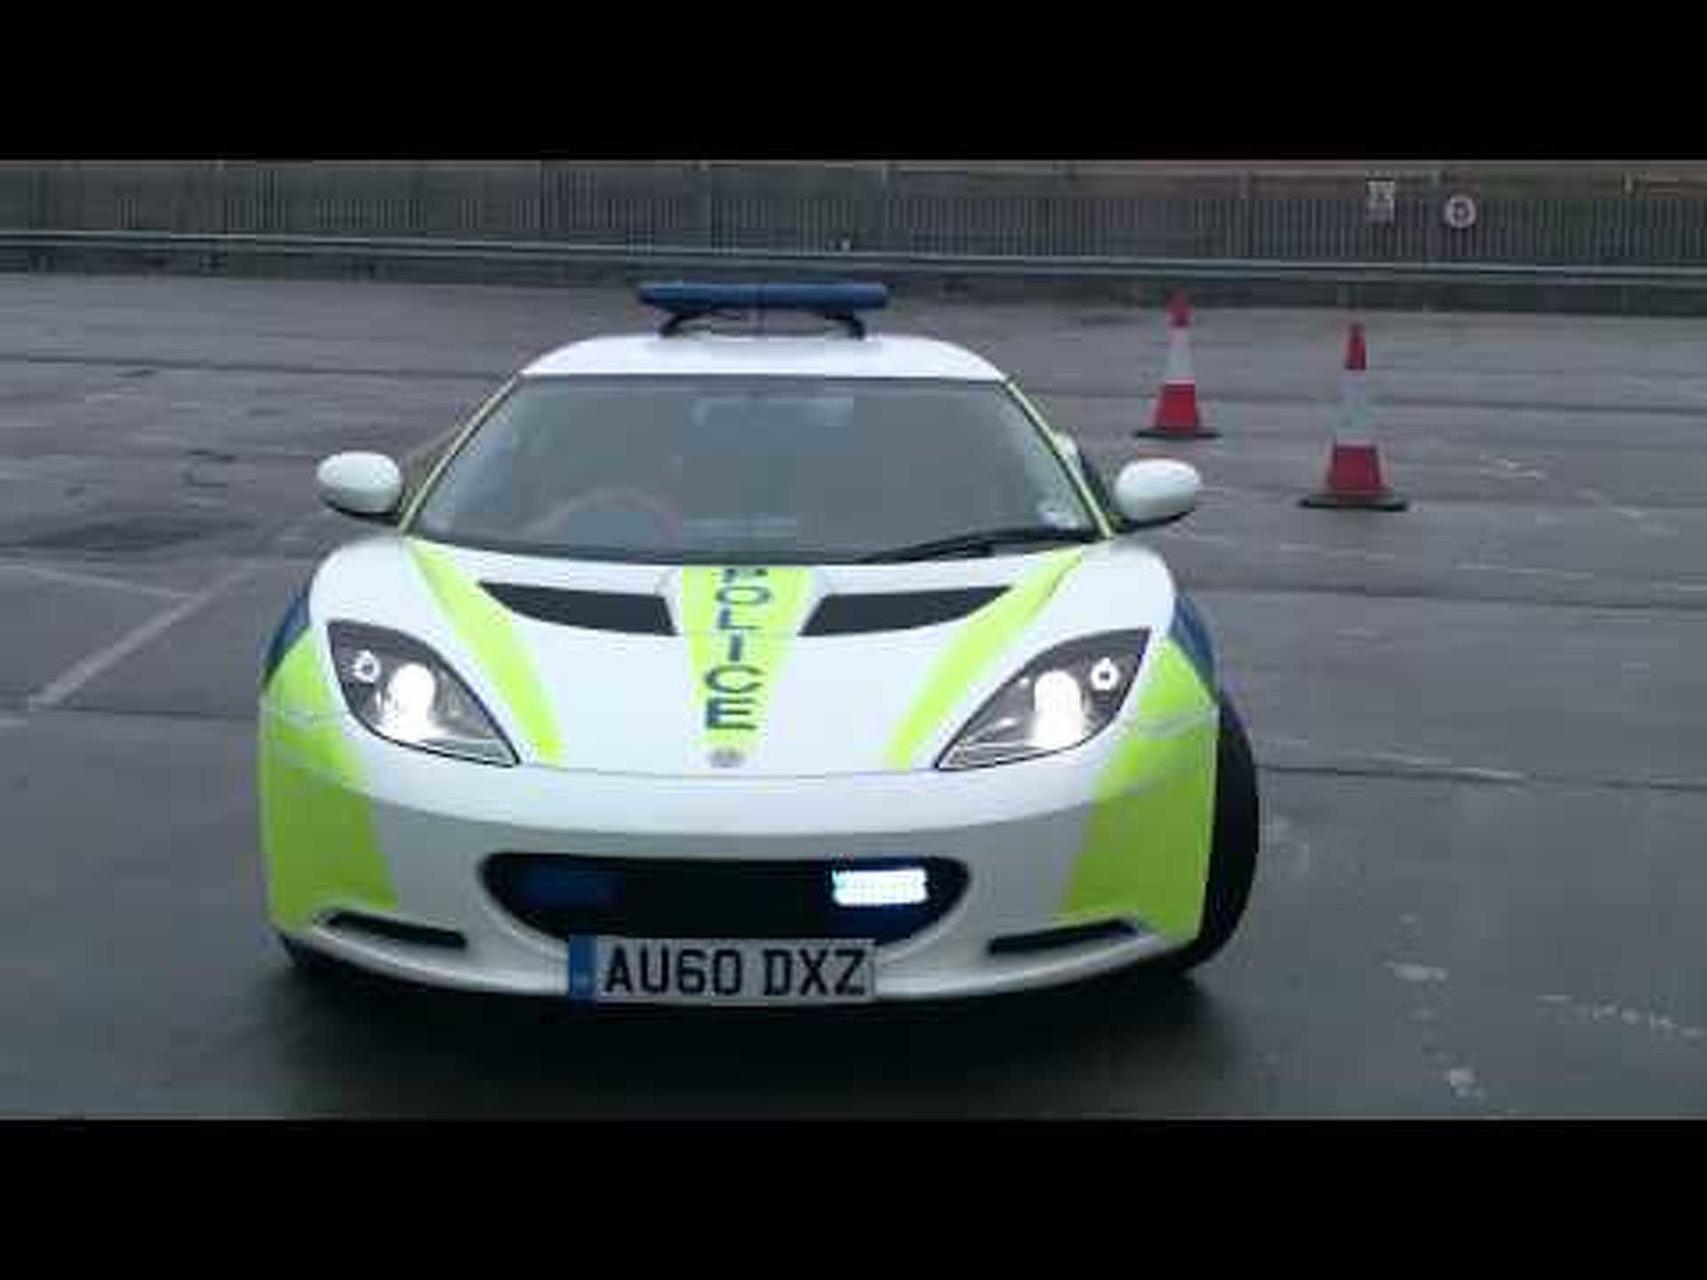 Police Lotus Evora - Central Motorway Police Group